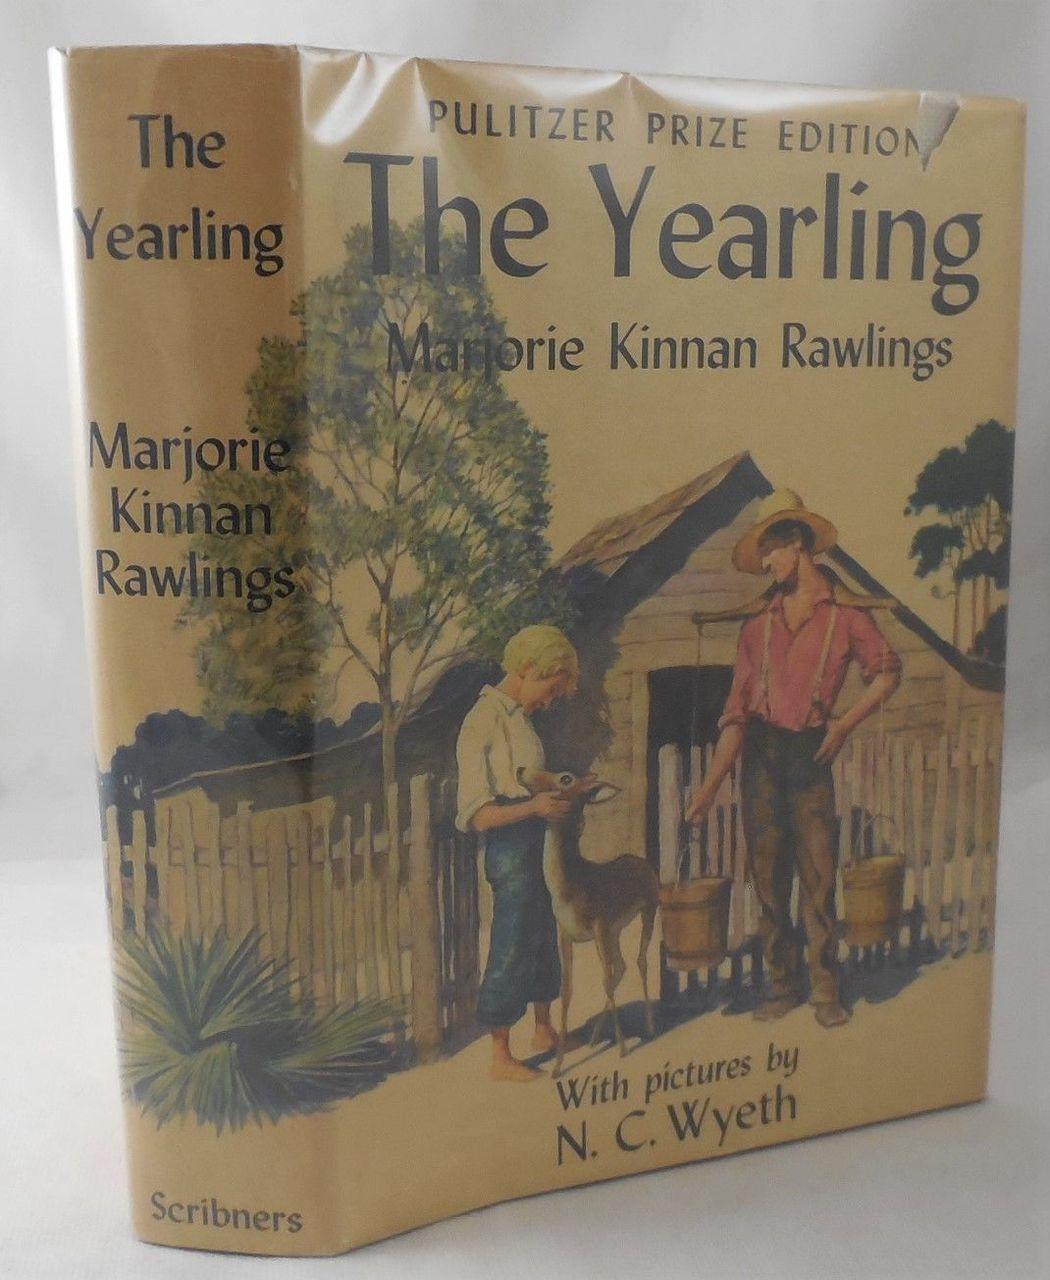 THE YEARLING, by Marjorie Kinnan Rawling -1939 [1st Ed]